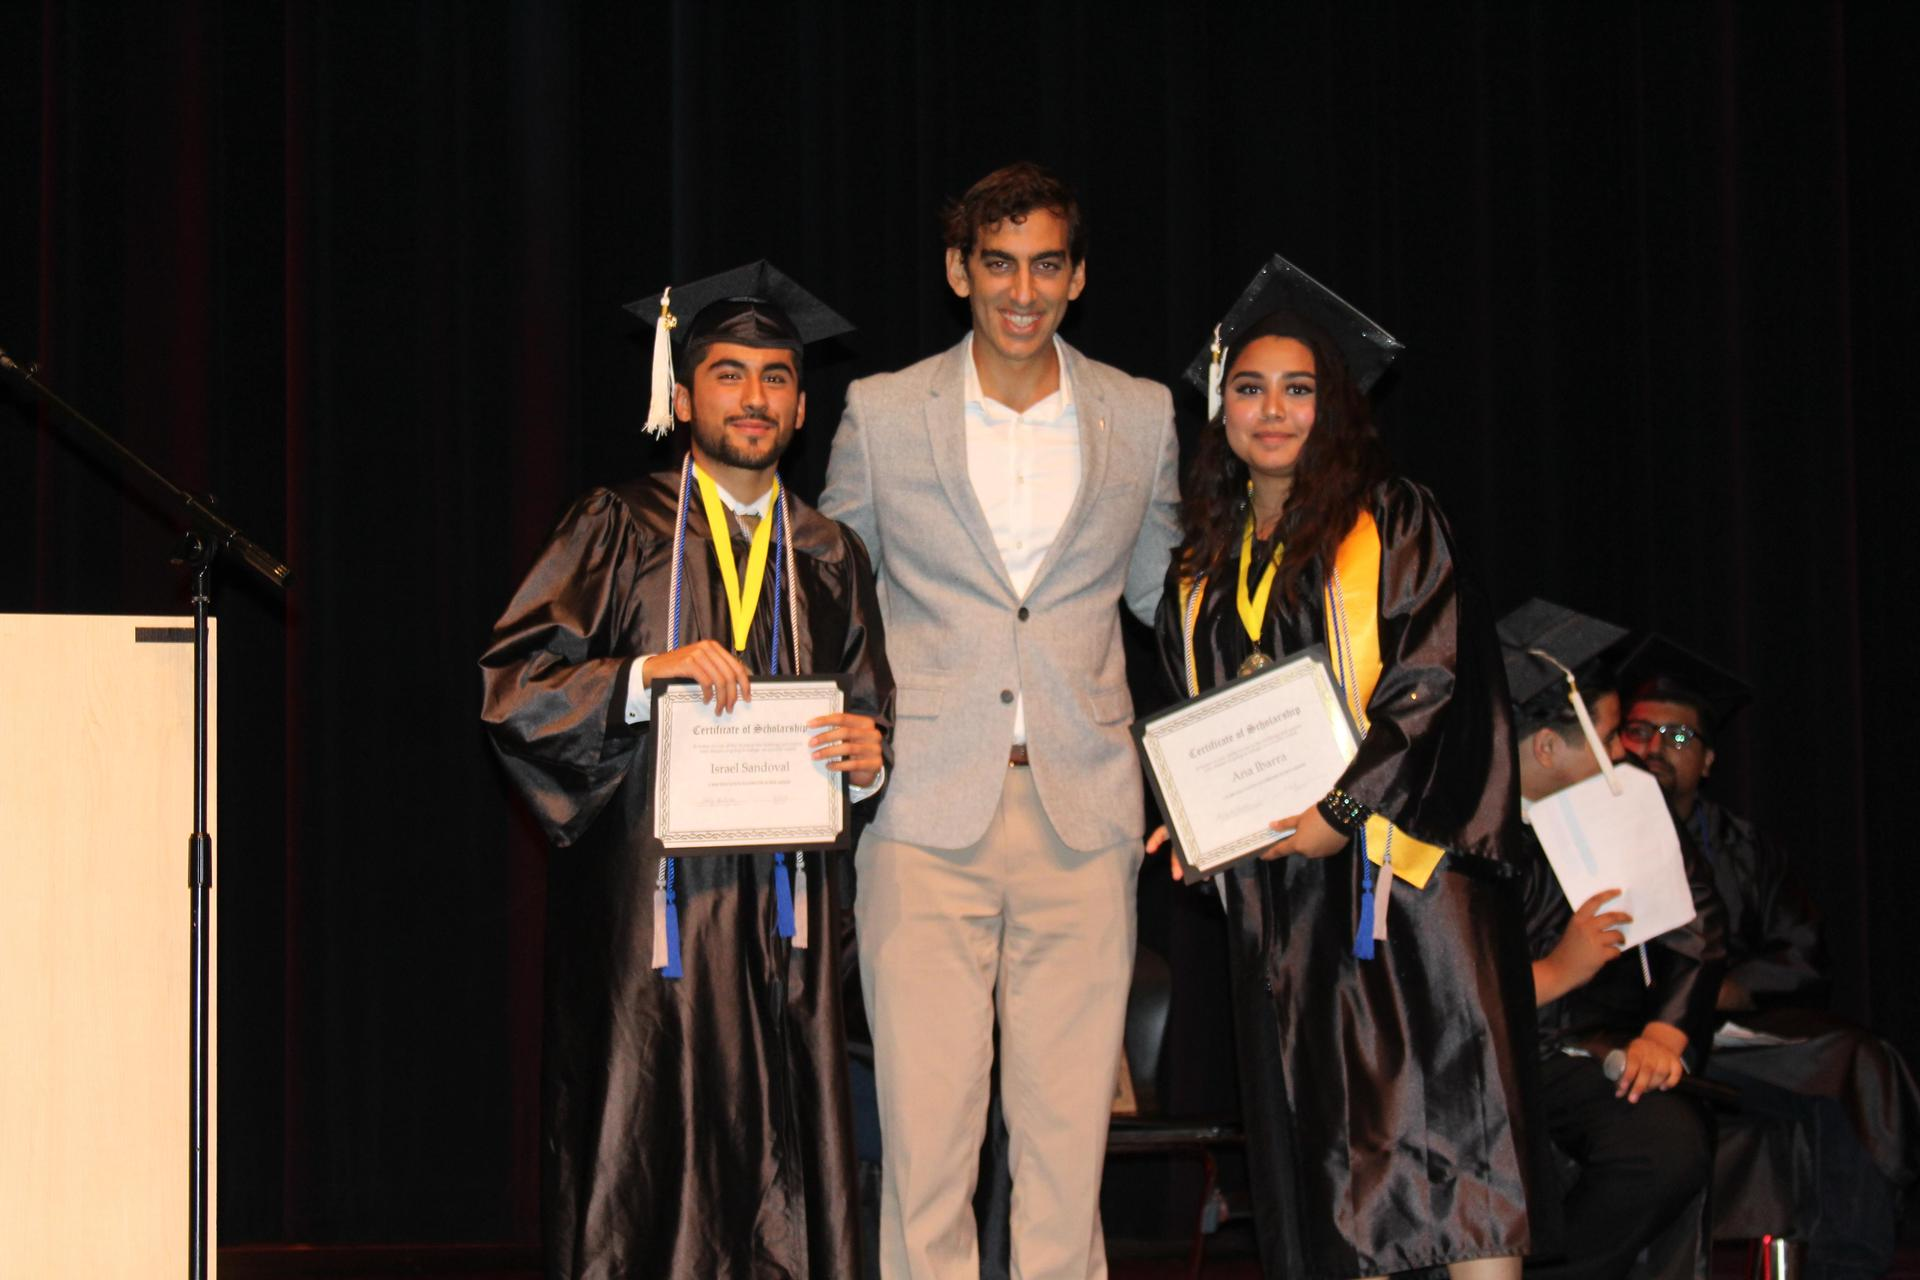 Lennox scholarship winners